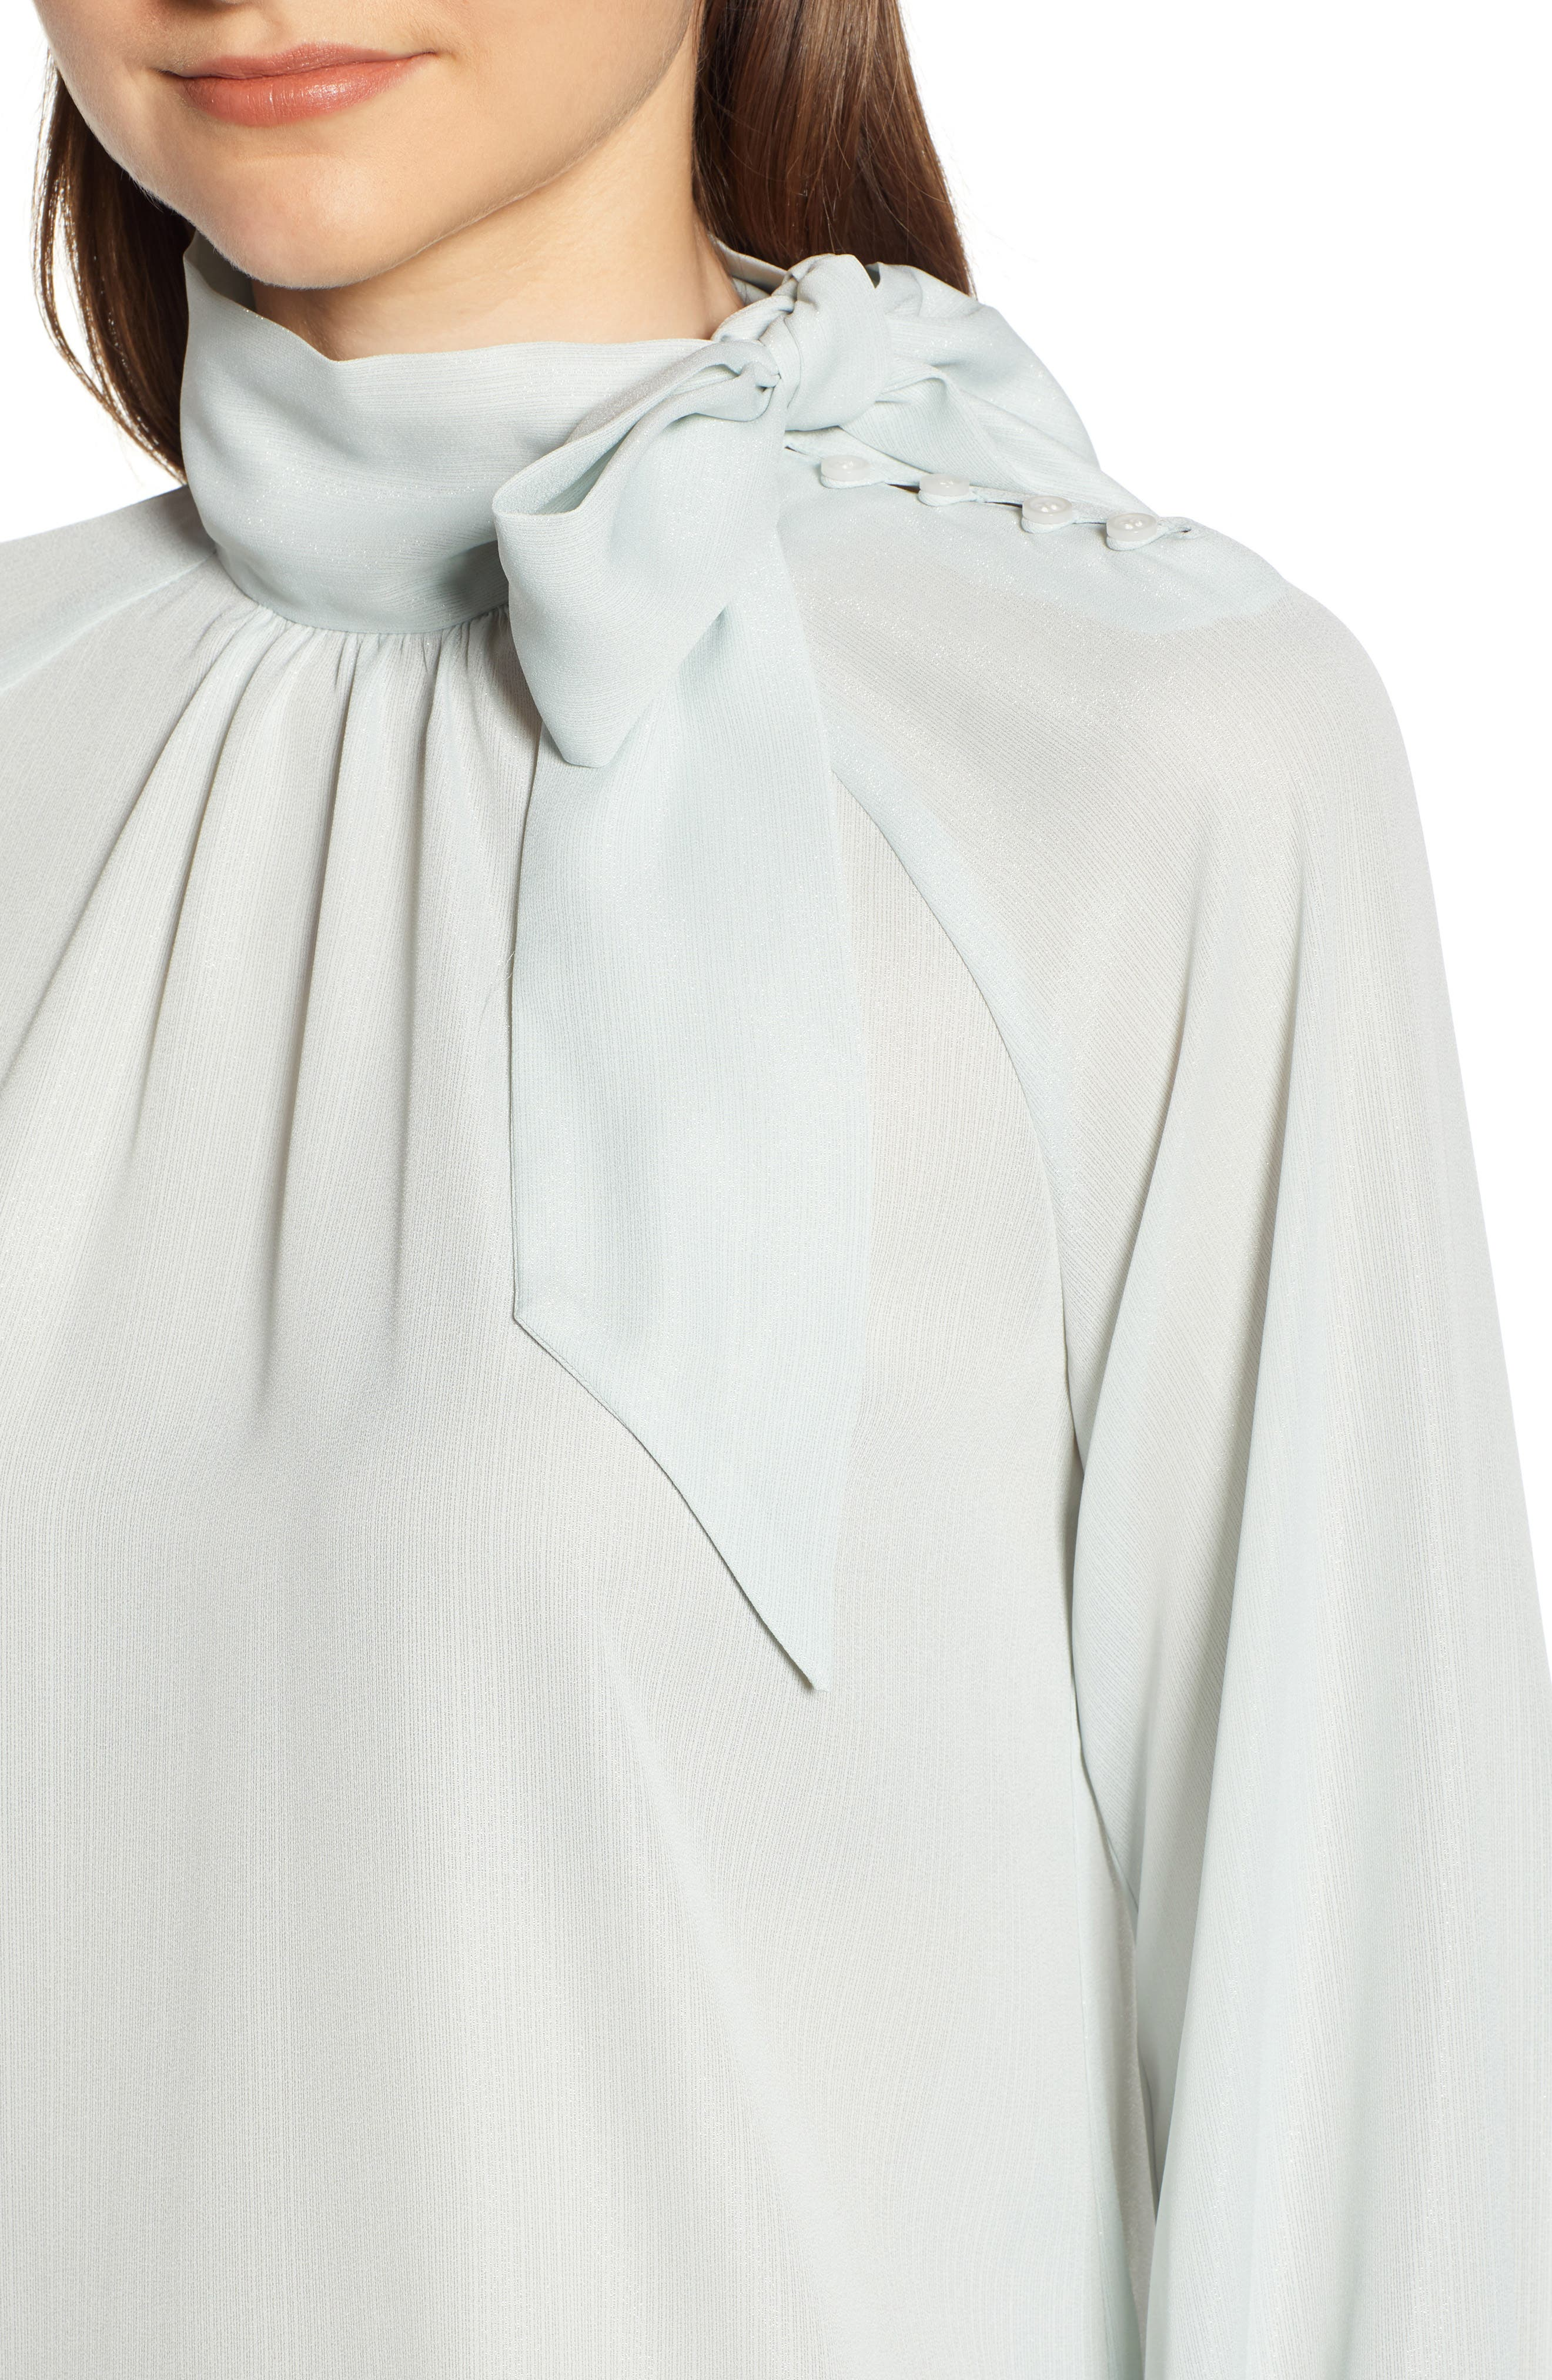 Tie Neck Shimmer Top,                             Alternate thumbnail 4, color,                             BLUE GREY SHIMMER